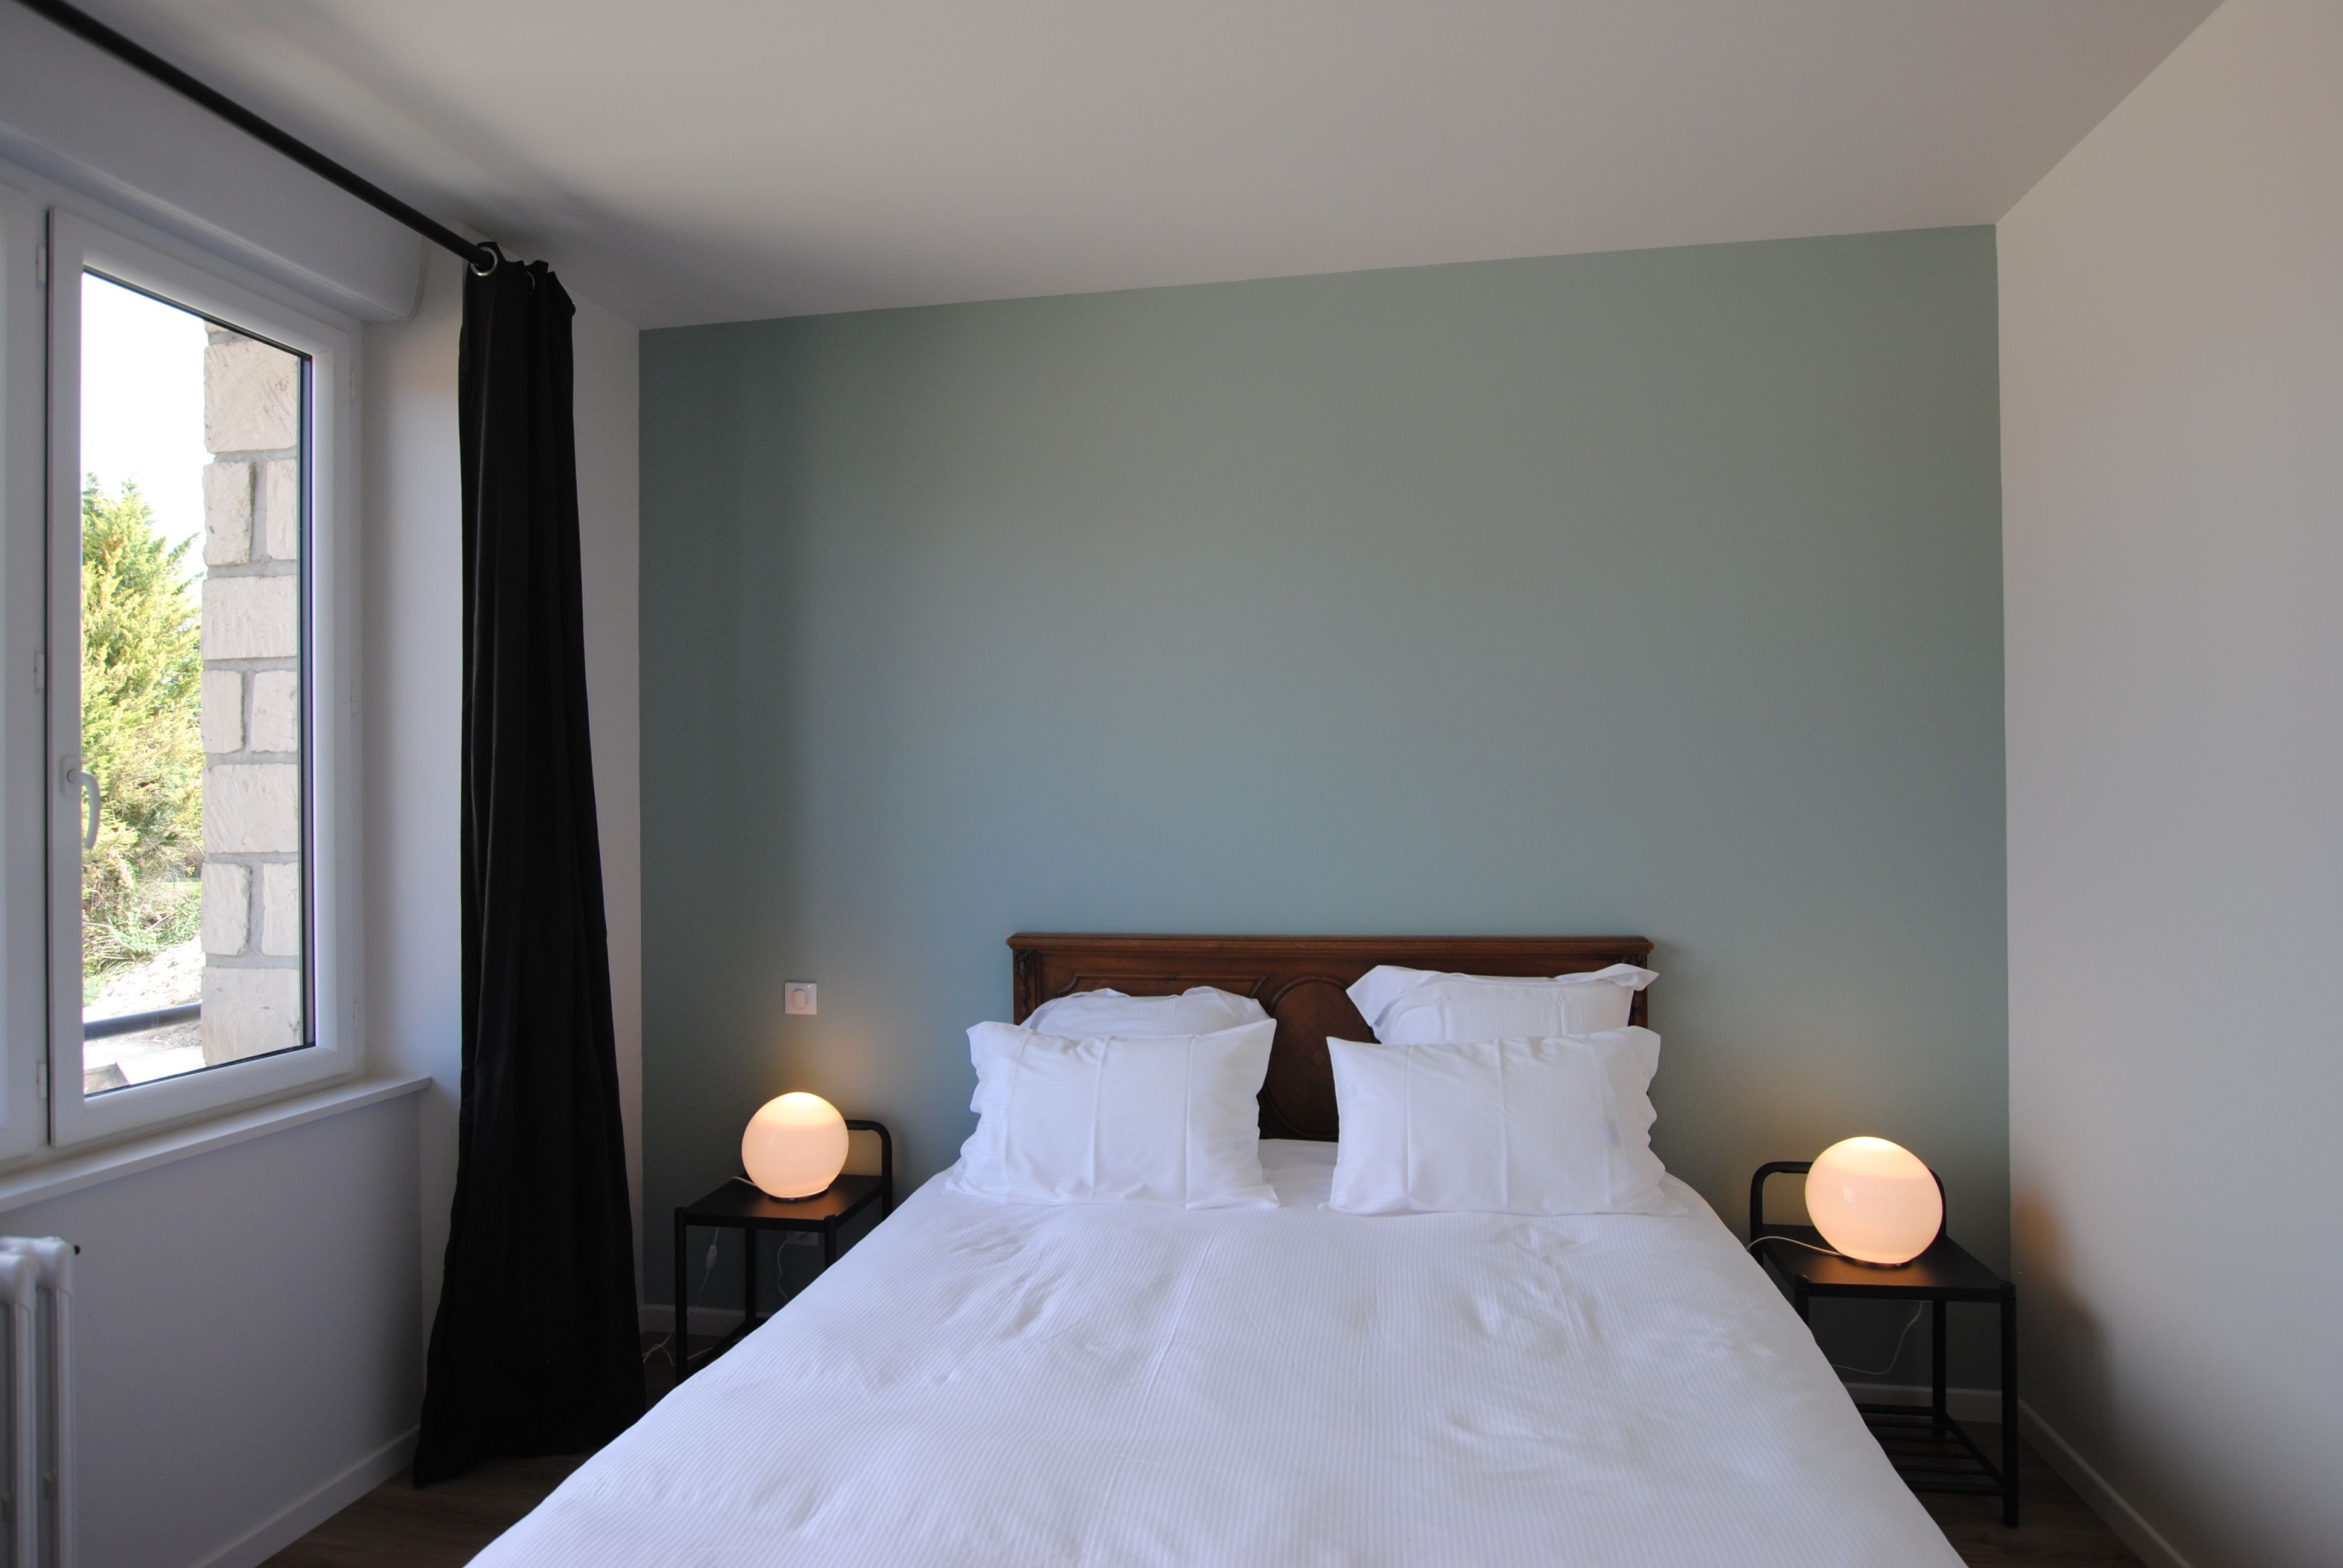 51G494 - Pogny - La Maison Gabriel - chambre 6